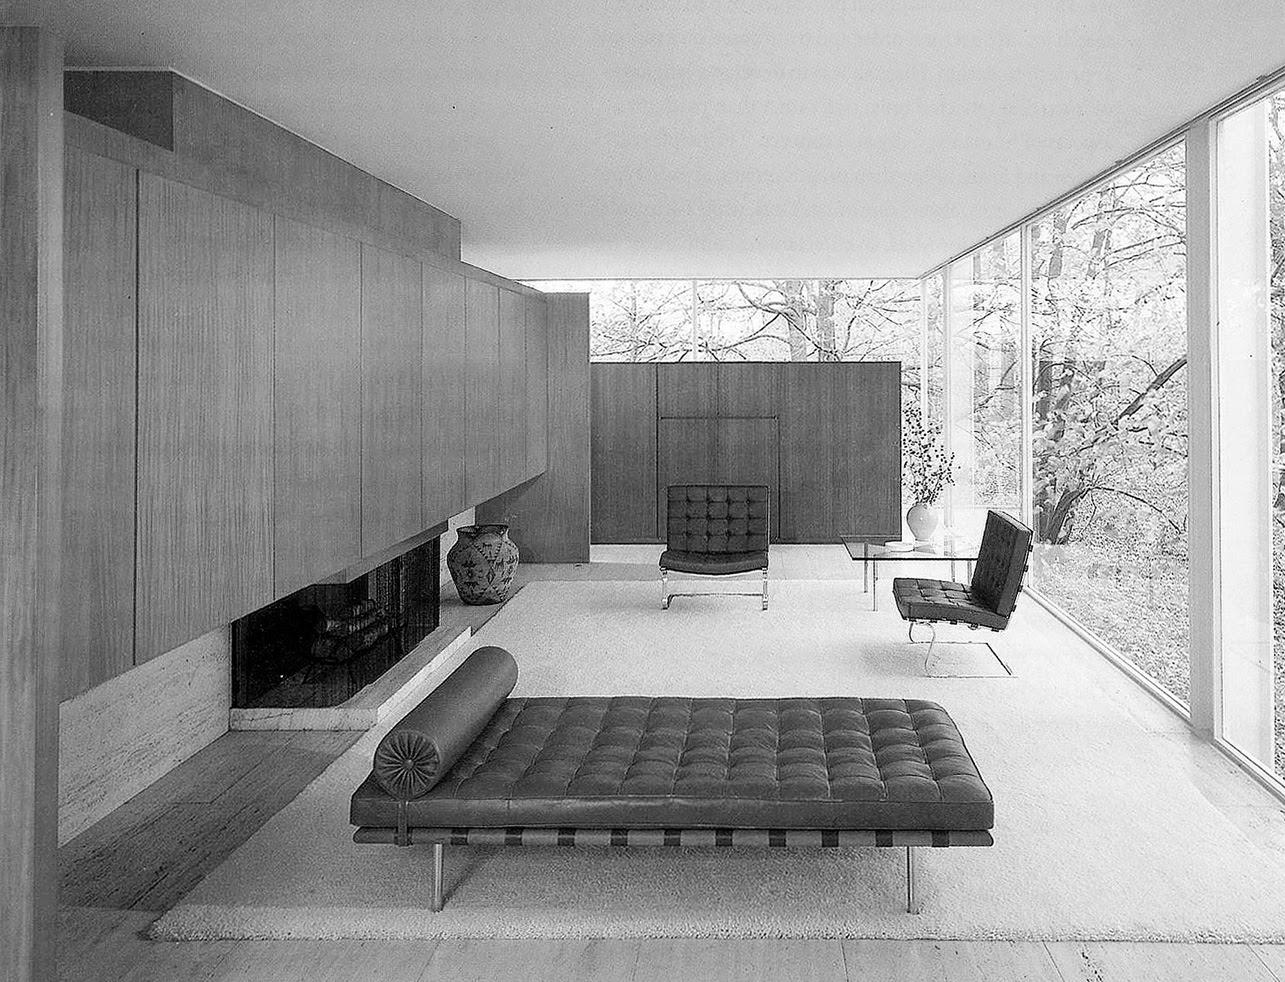 decortherapia decortherapia para falabella el nacimiento de un cl sico la silla barcelona. Black Bedroom Furniture Sets. Home Design Ideas